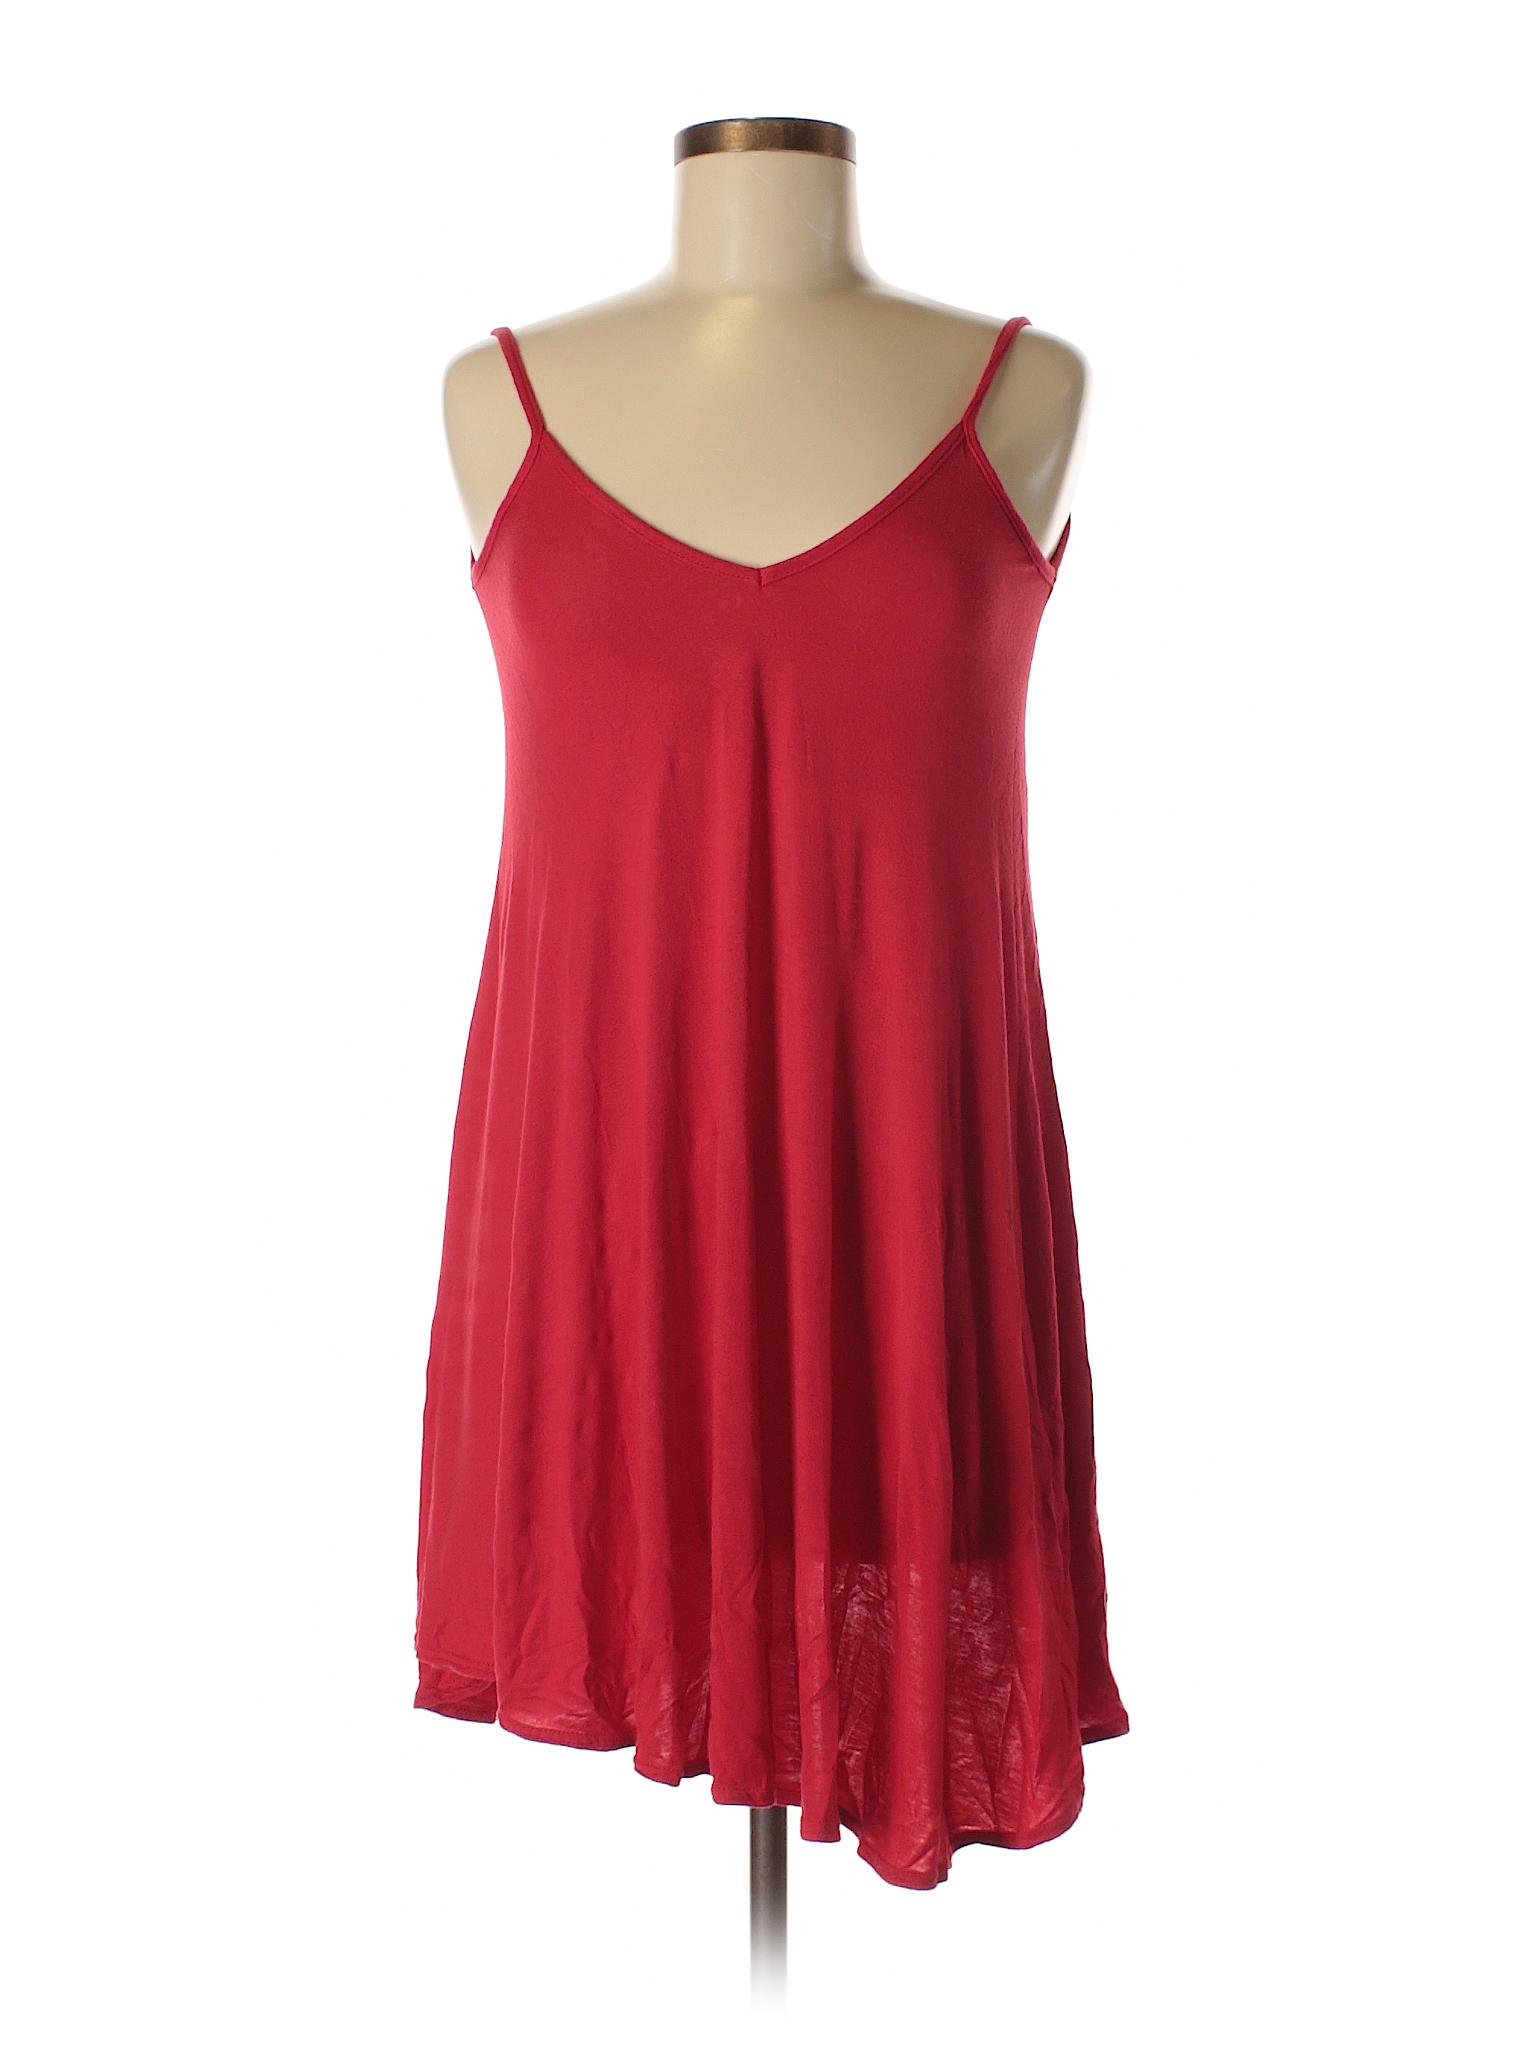 winter Boohoo Boutique Boutique Dress Casual PHq1qBd